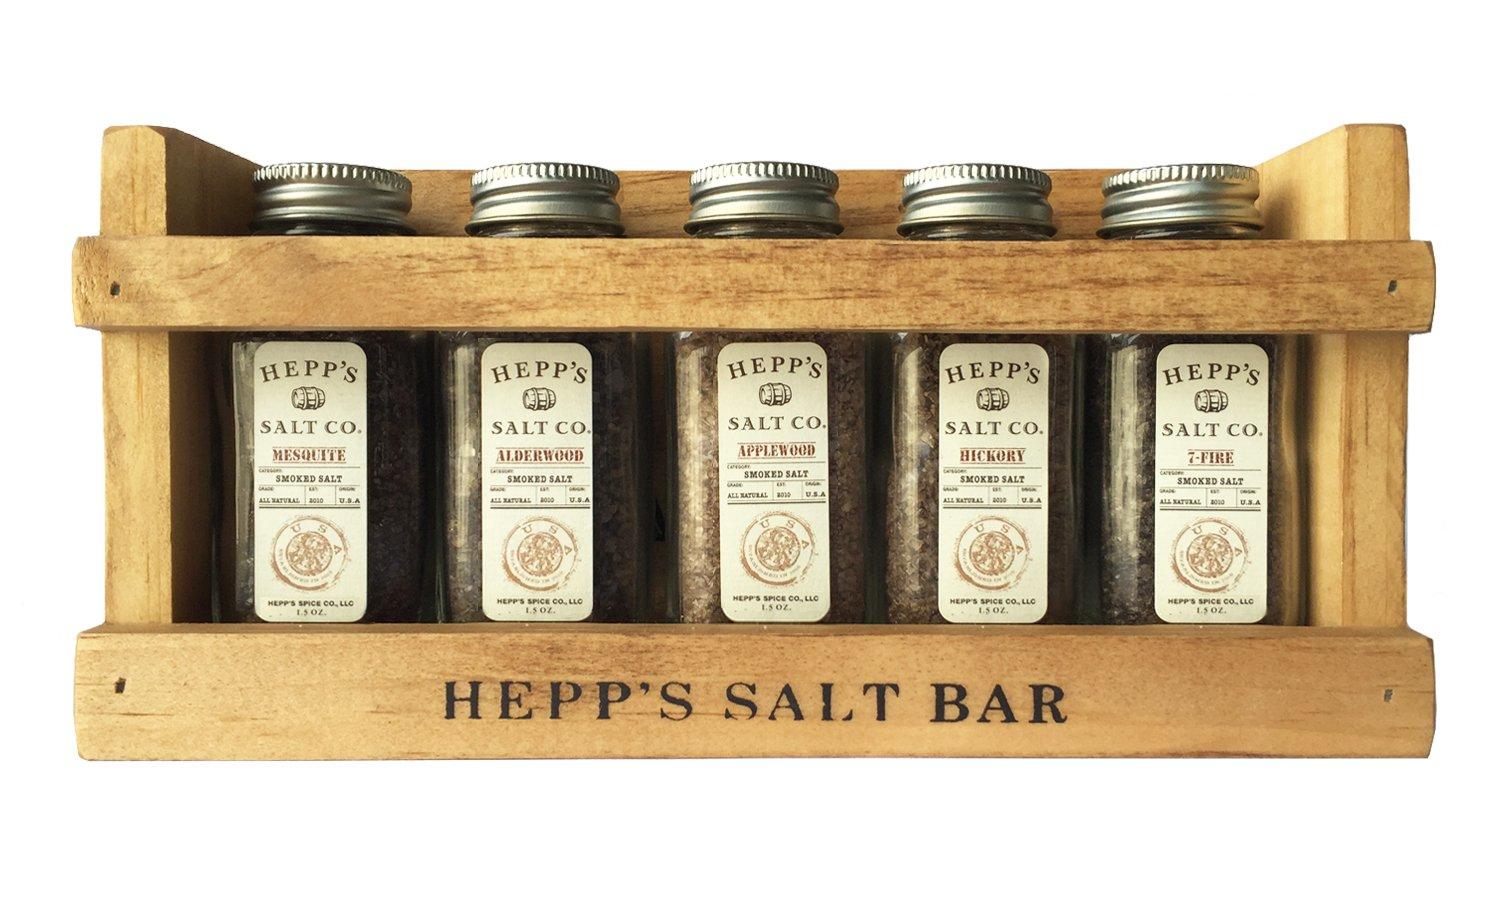 HEPP'S Salt Co. Smokehouse Collection- Mini Salt Bar Gift set